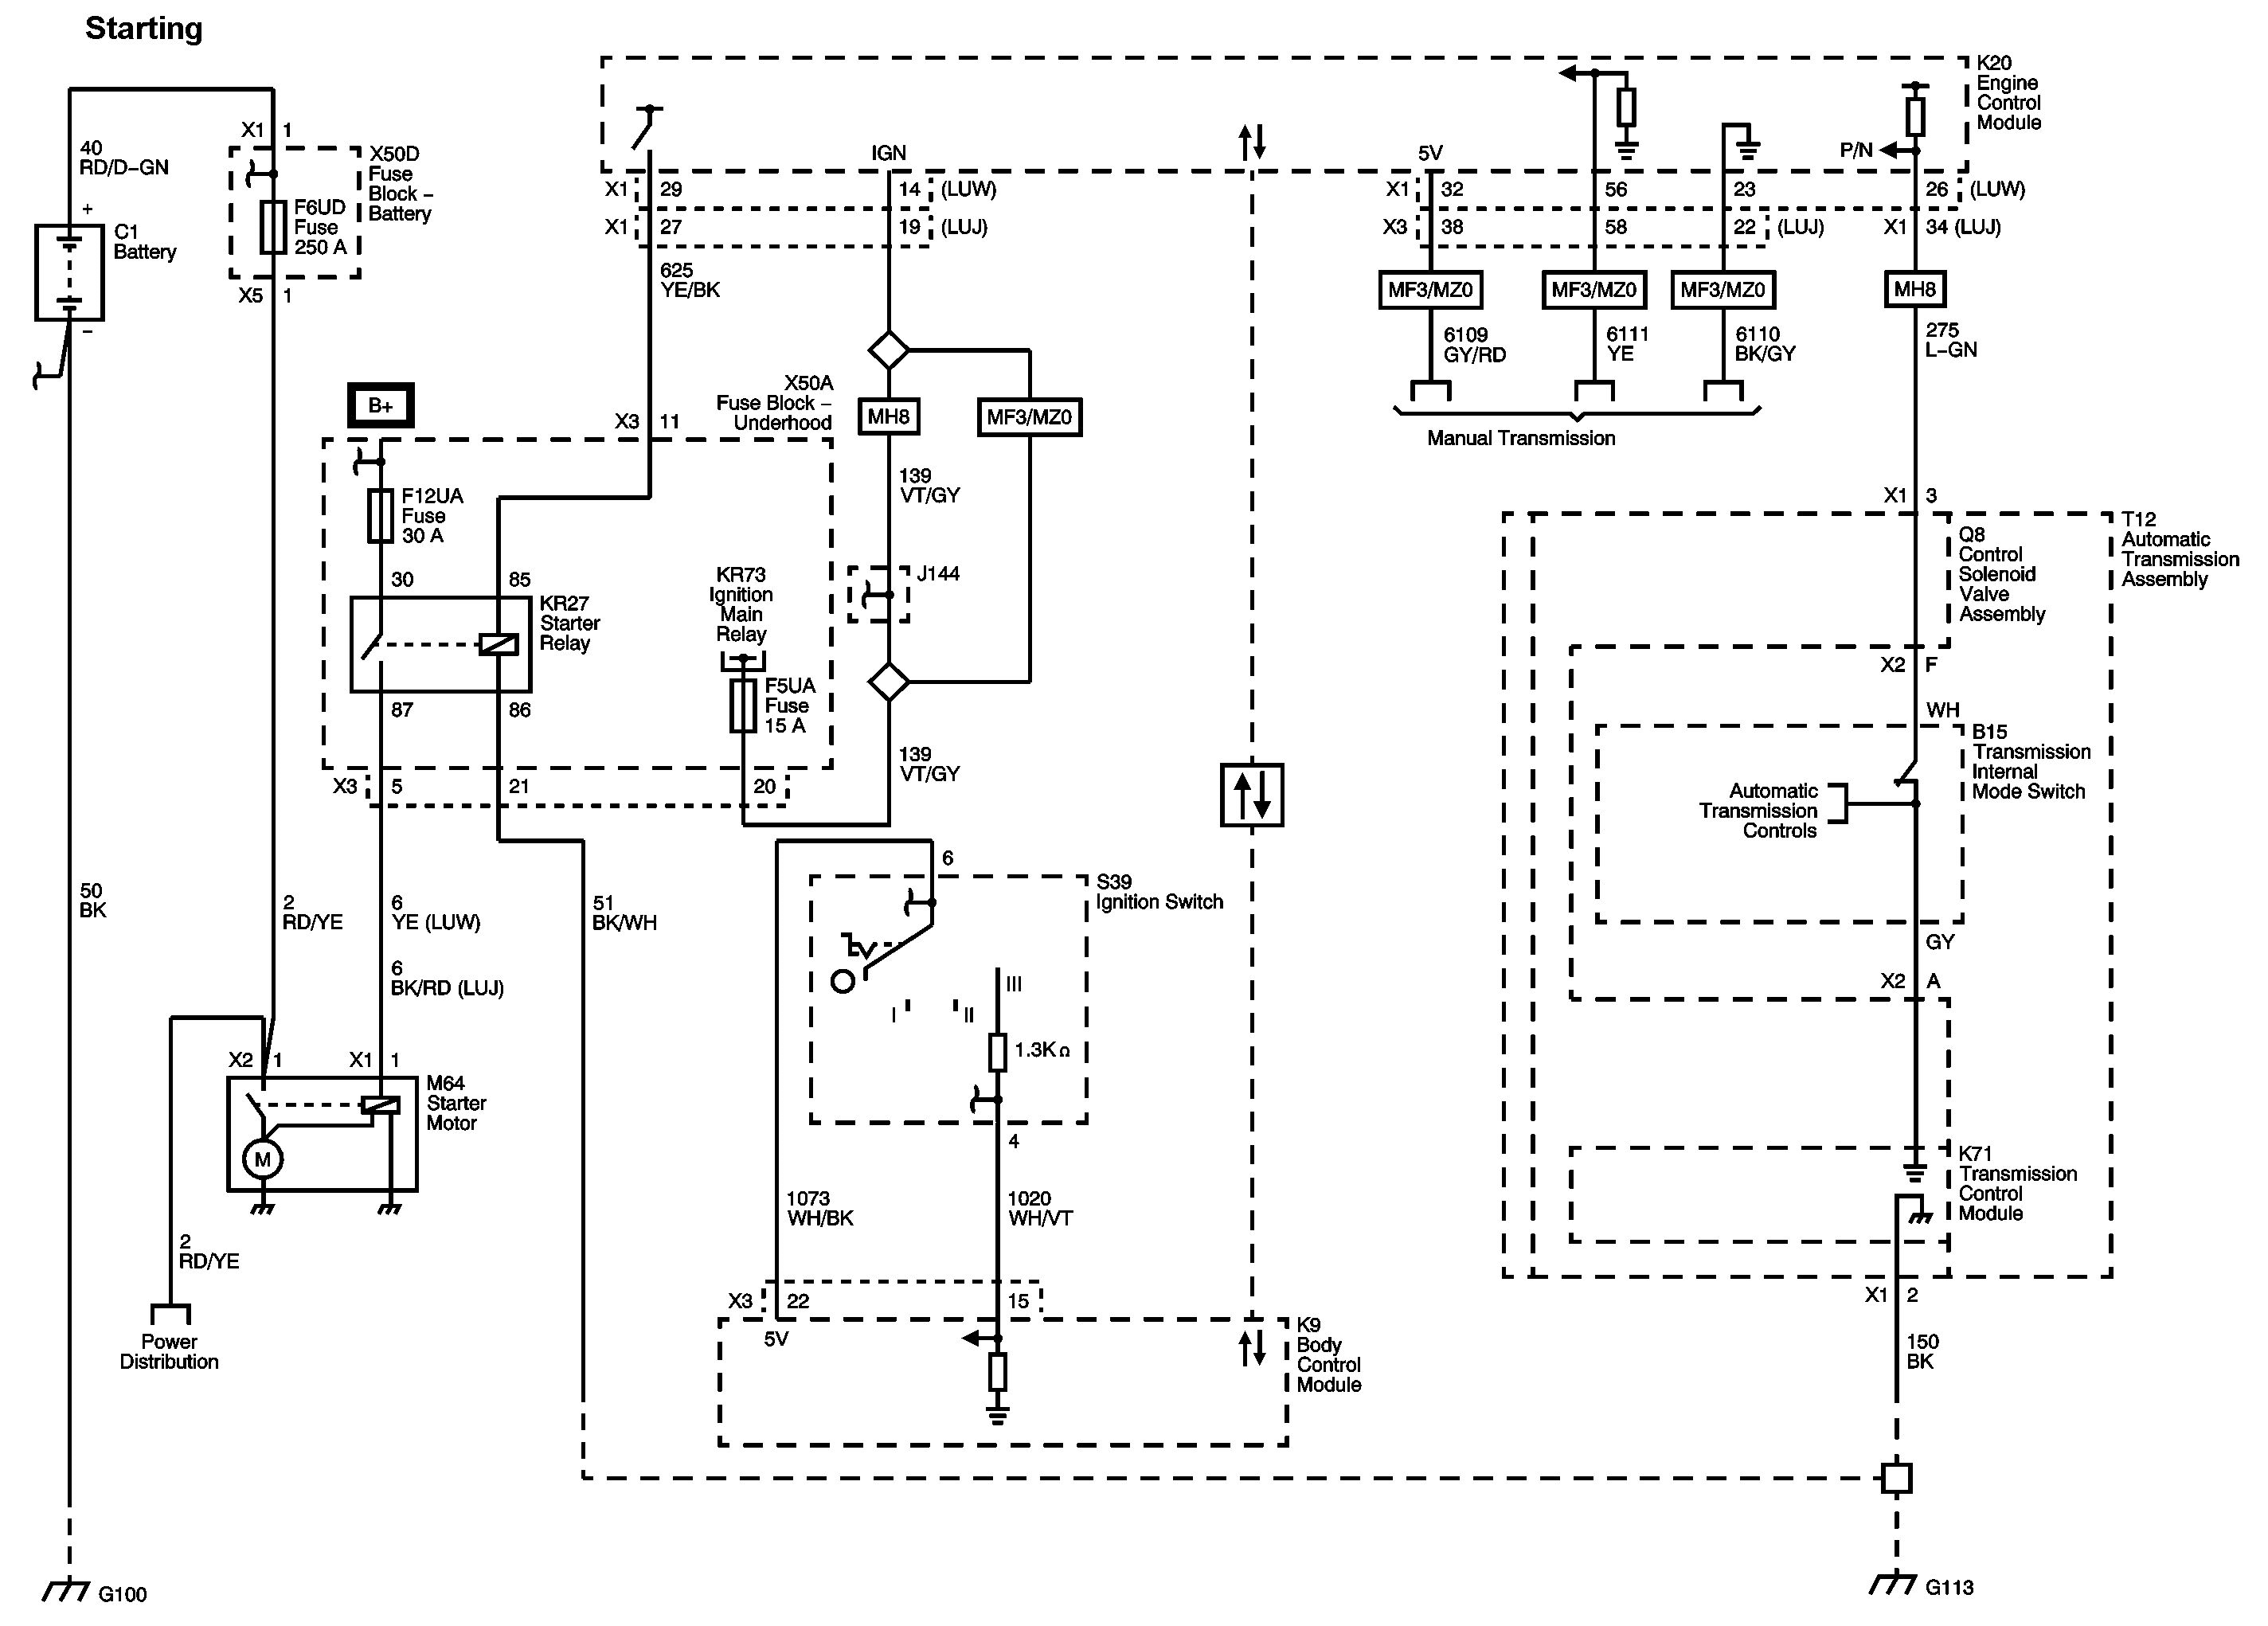 Chevy Cruze O2 Sensor Wiring Diagram | Wiring Diagrams Post receipts | Chevrolet Sonic Wiring Diagram |  | wiring diagram library